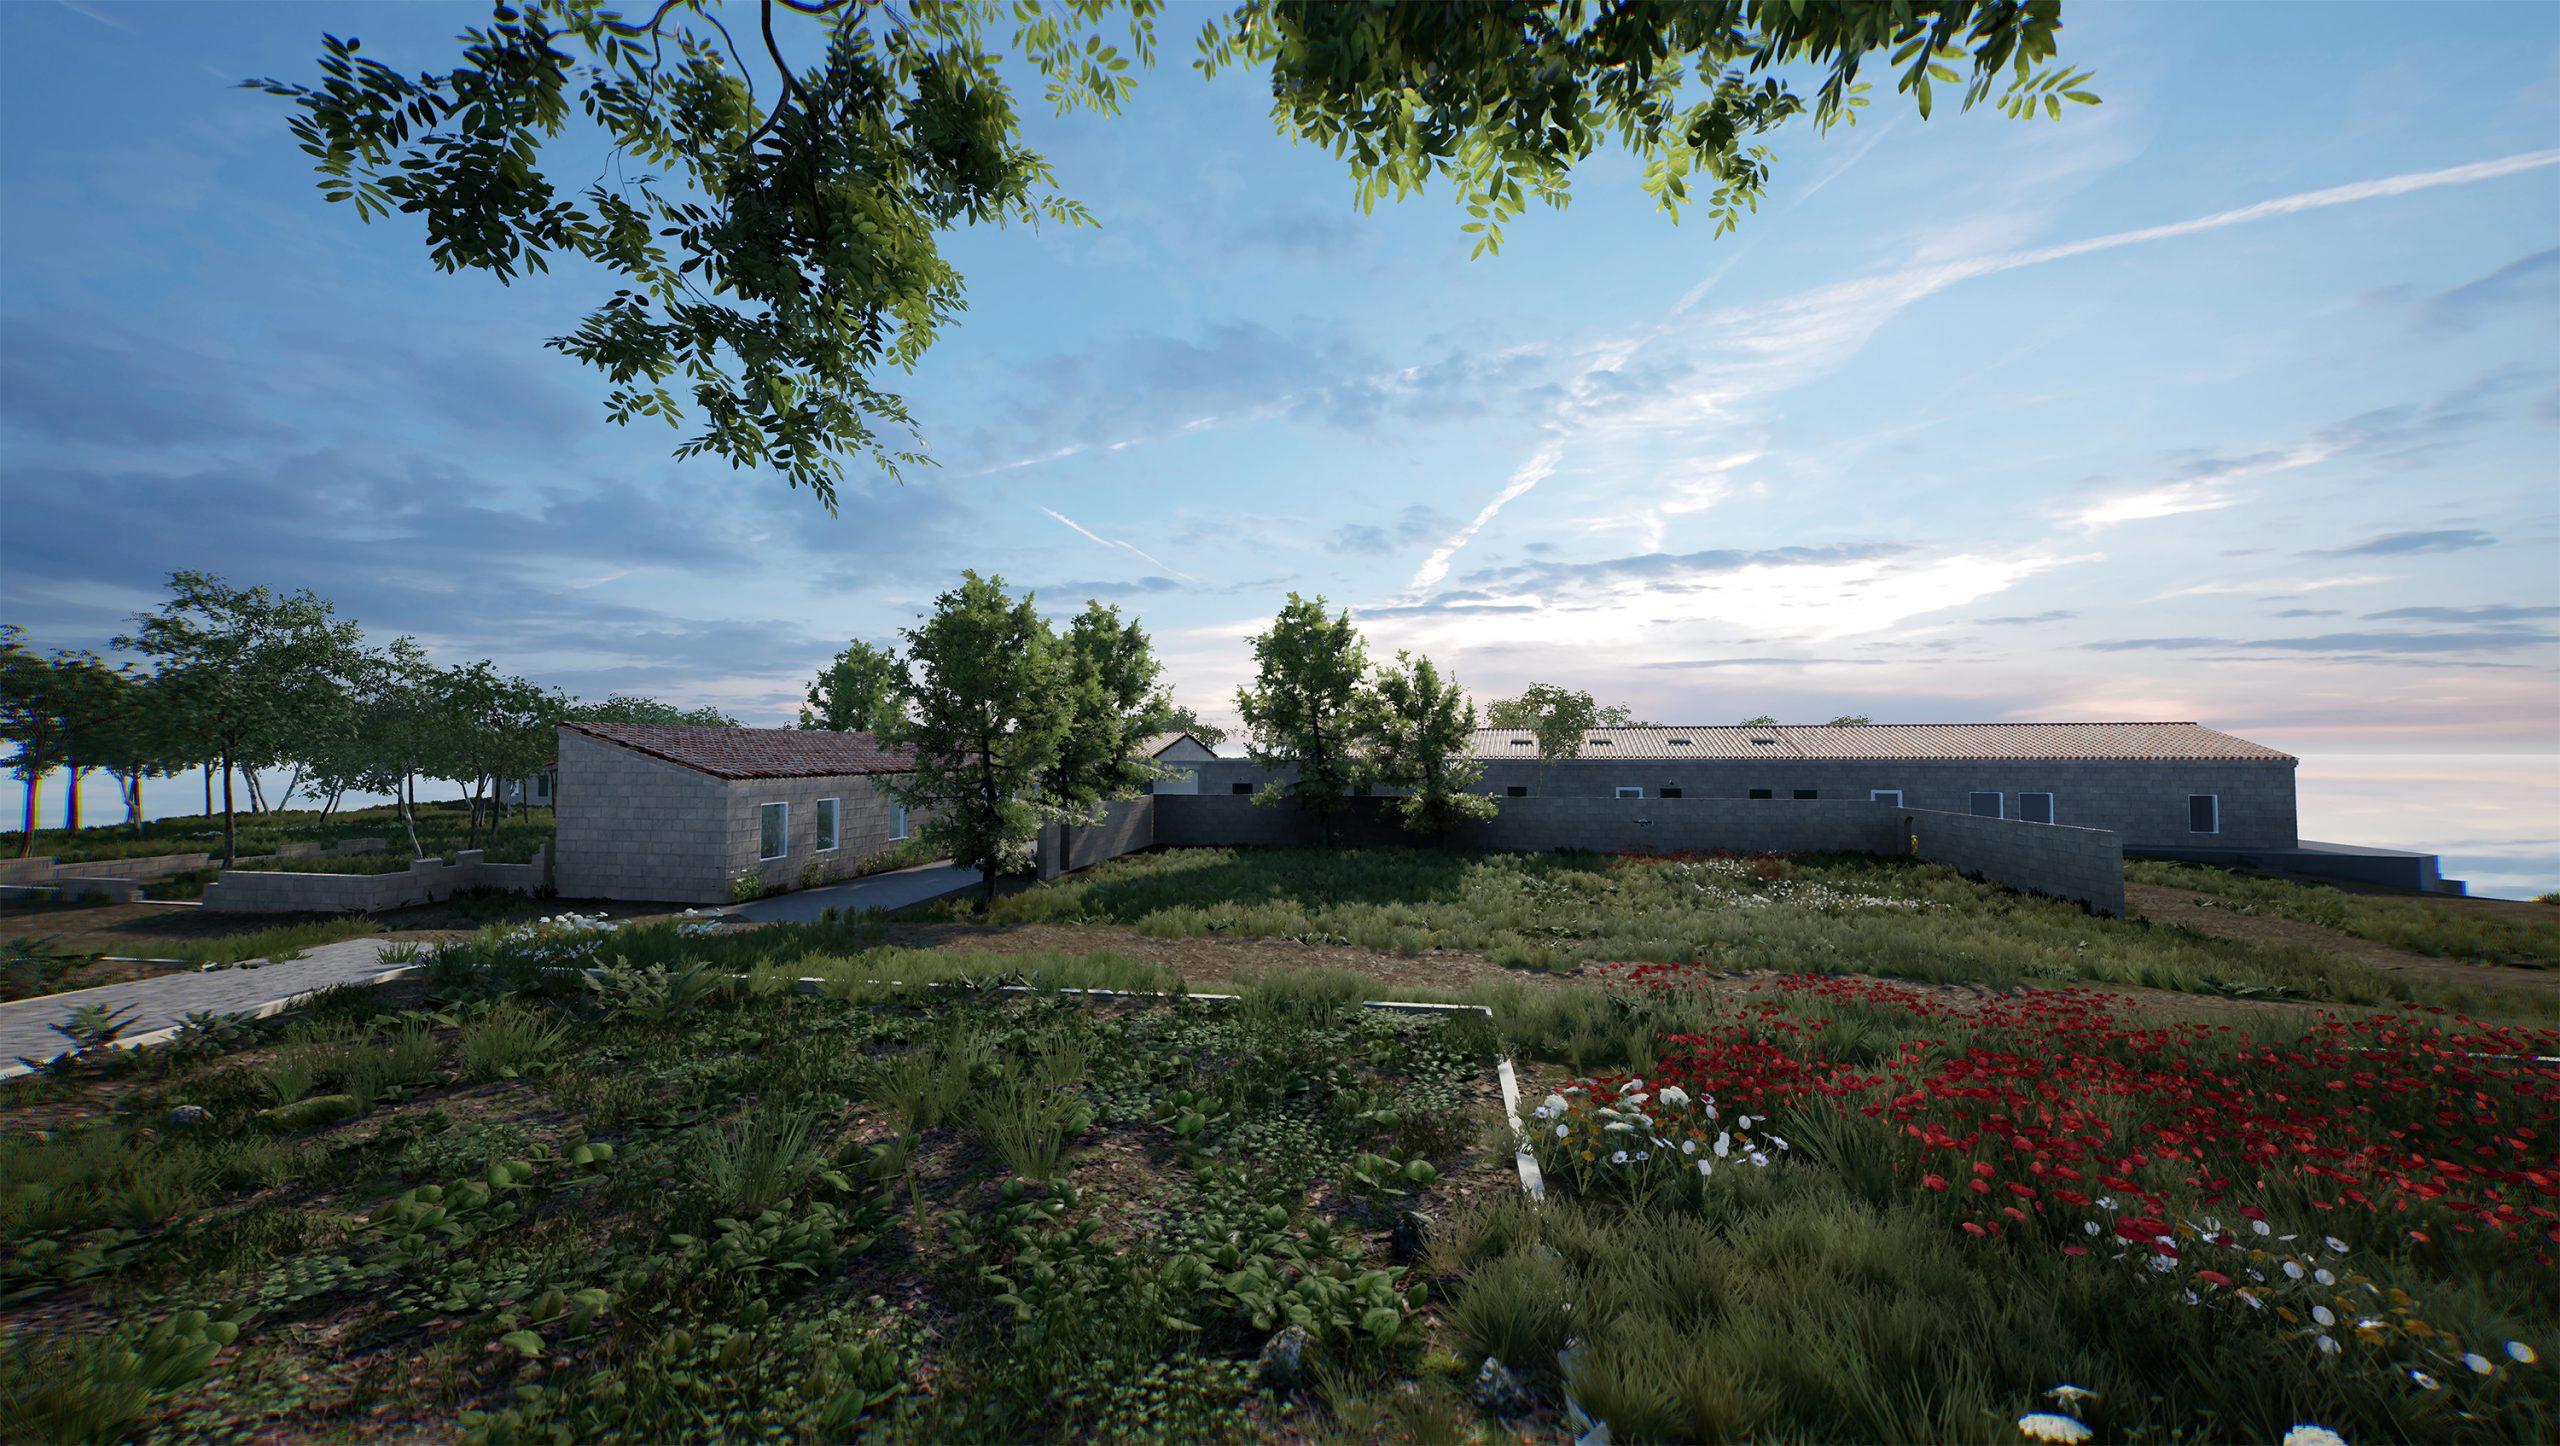 ArtLab, Hauser & Wirth Menorca exterior view created in HWVR Courtesy Hauser & Wirth